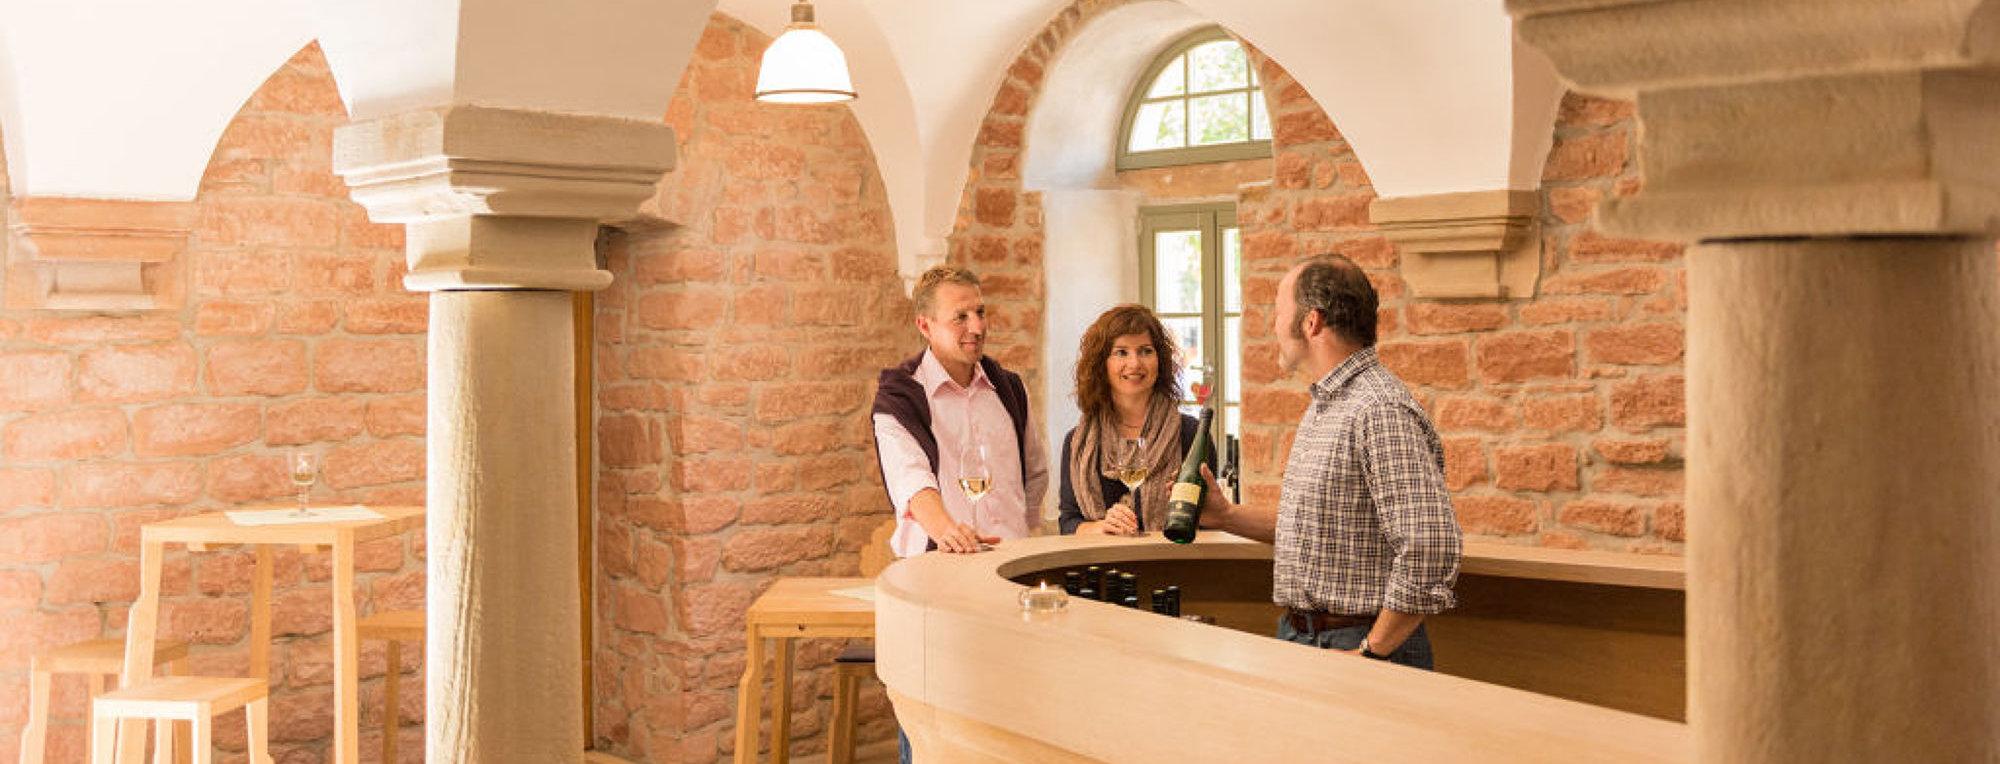 Wine tasting at a winery in Langenlonsheim, Nahe